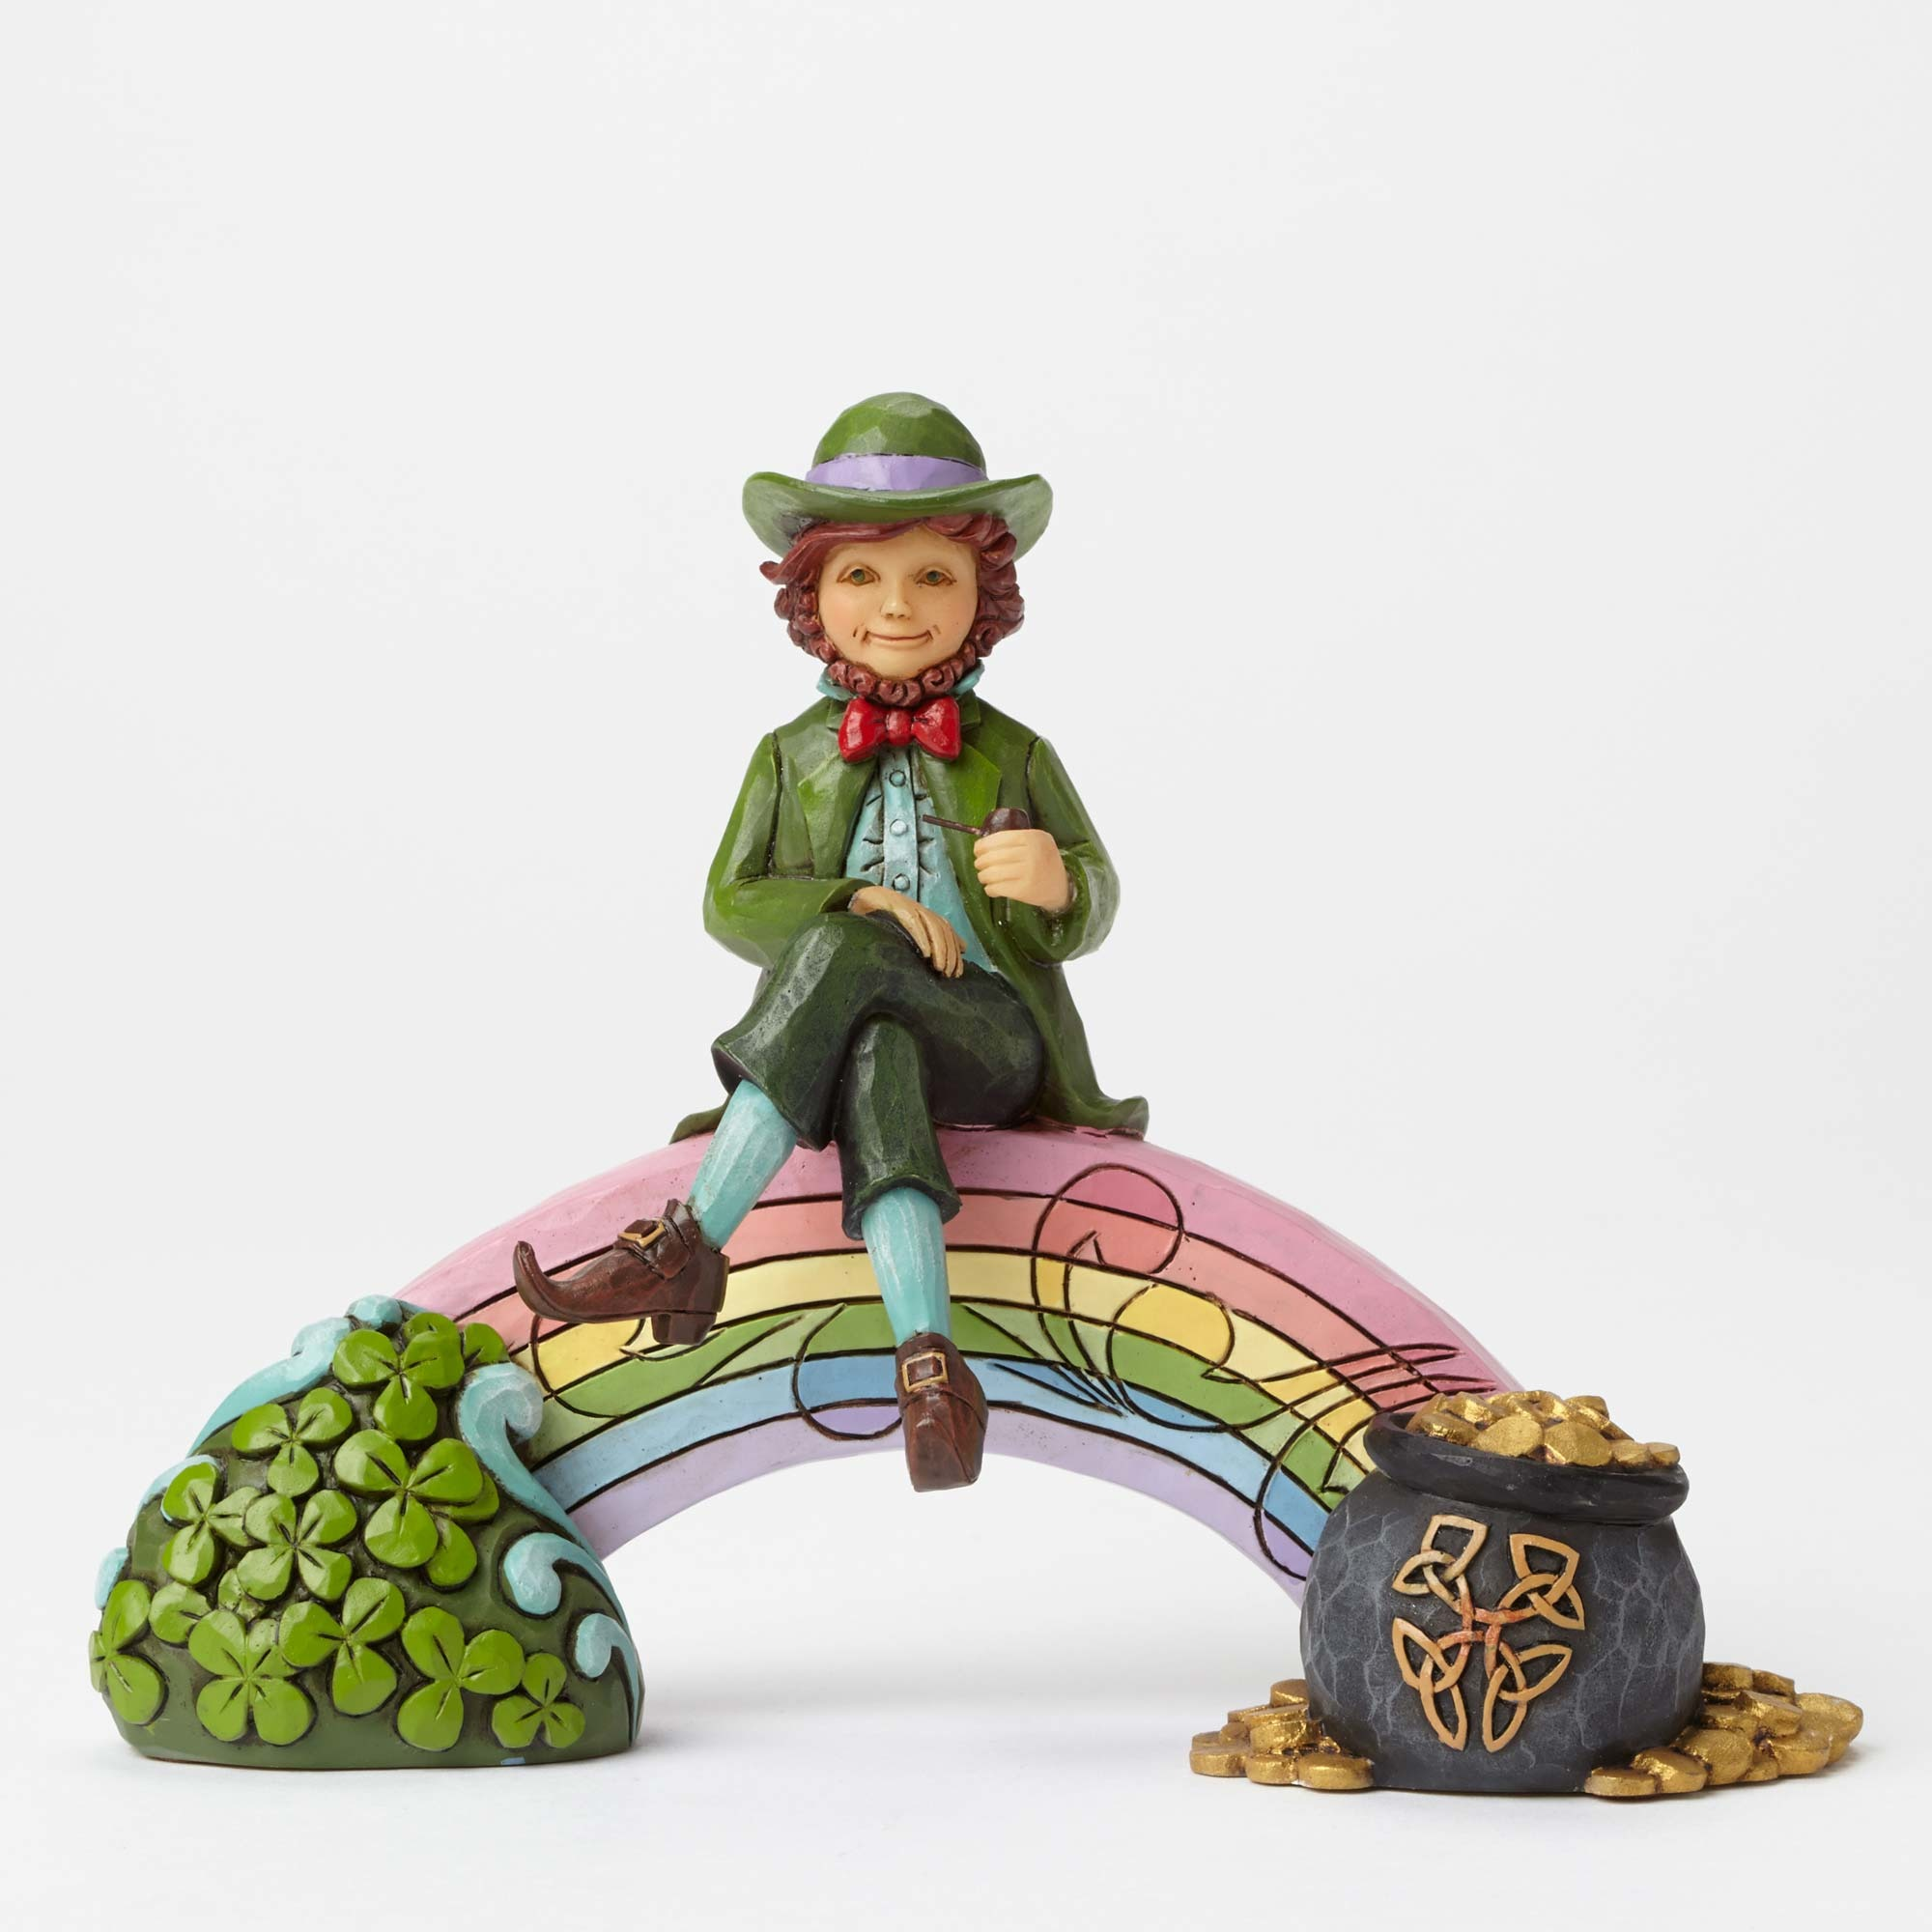 Personalized Stockings Jim Shore Heartwood Creek 4051397 Leprechaun On Rainbow